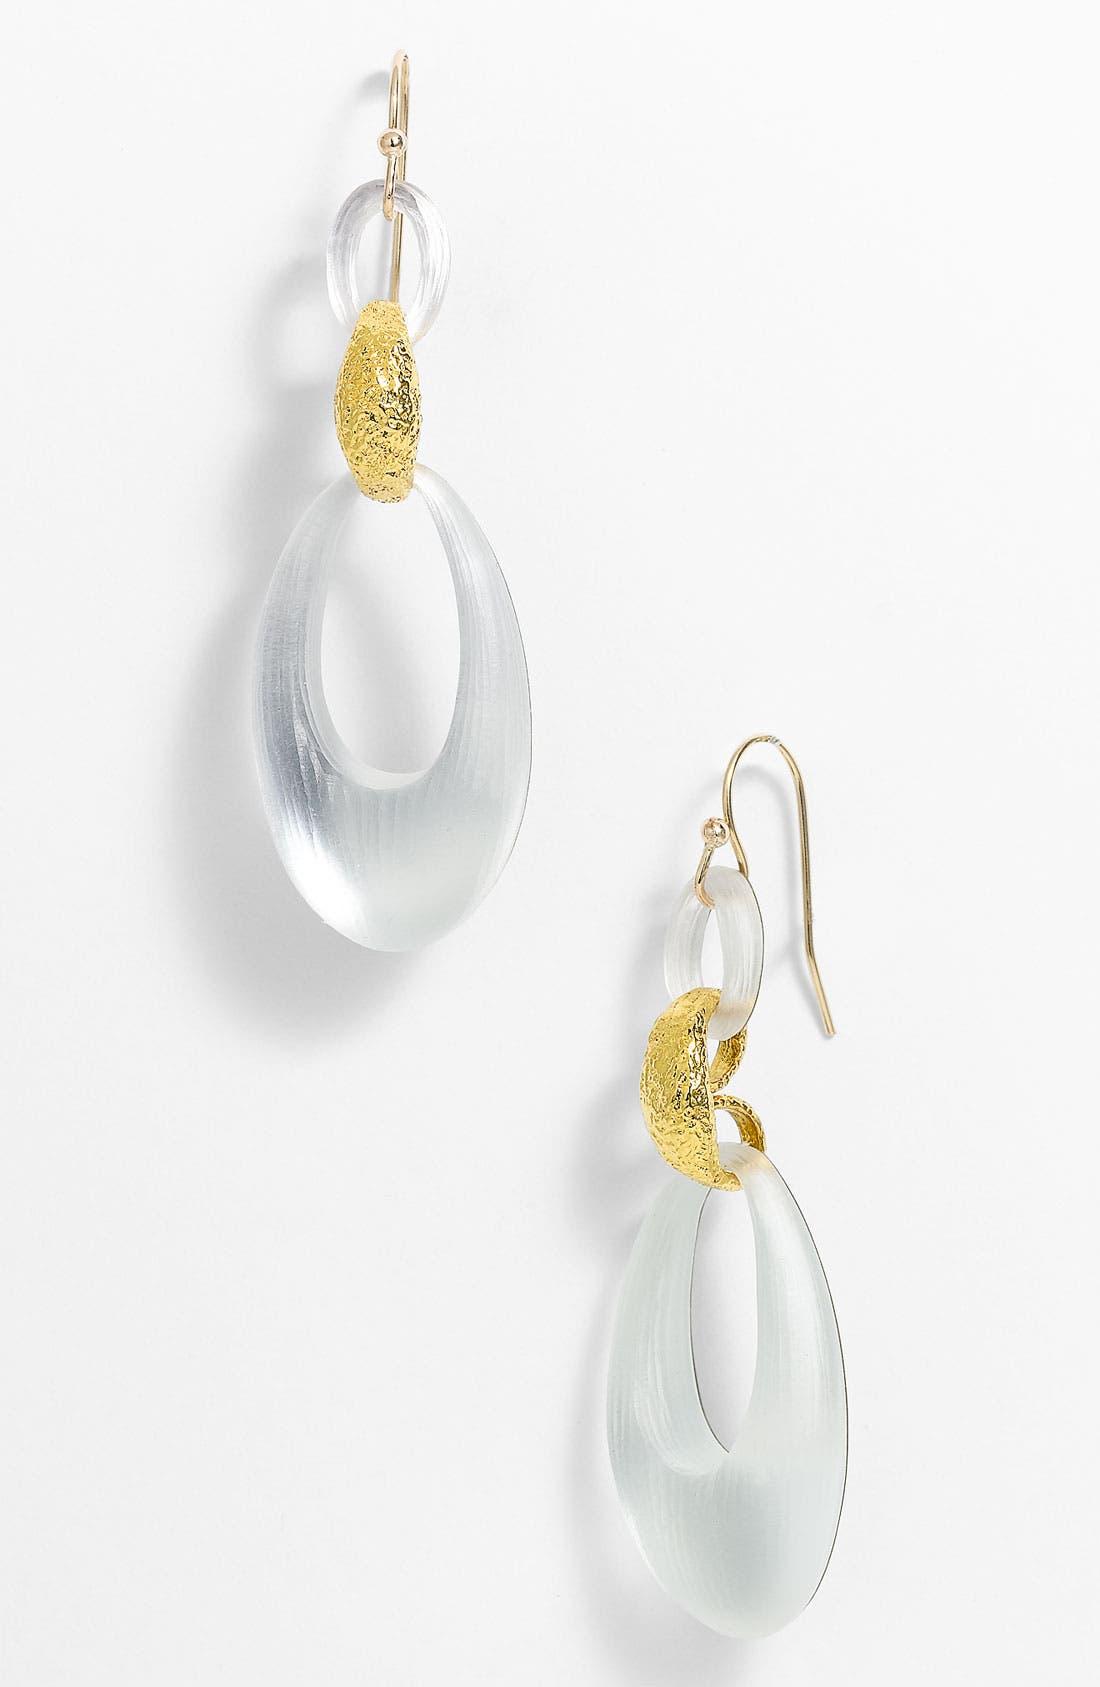 Alternate Image 1 Selected - Alexis Bittar Double Link Earrings